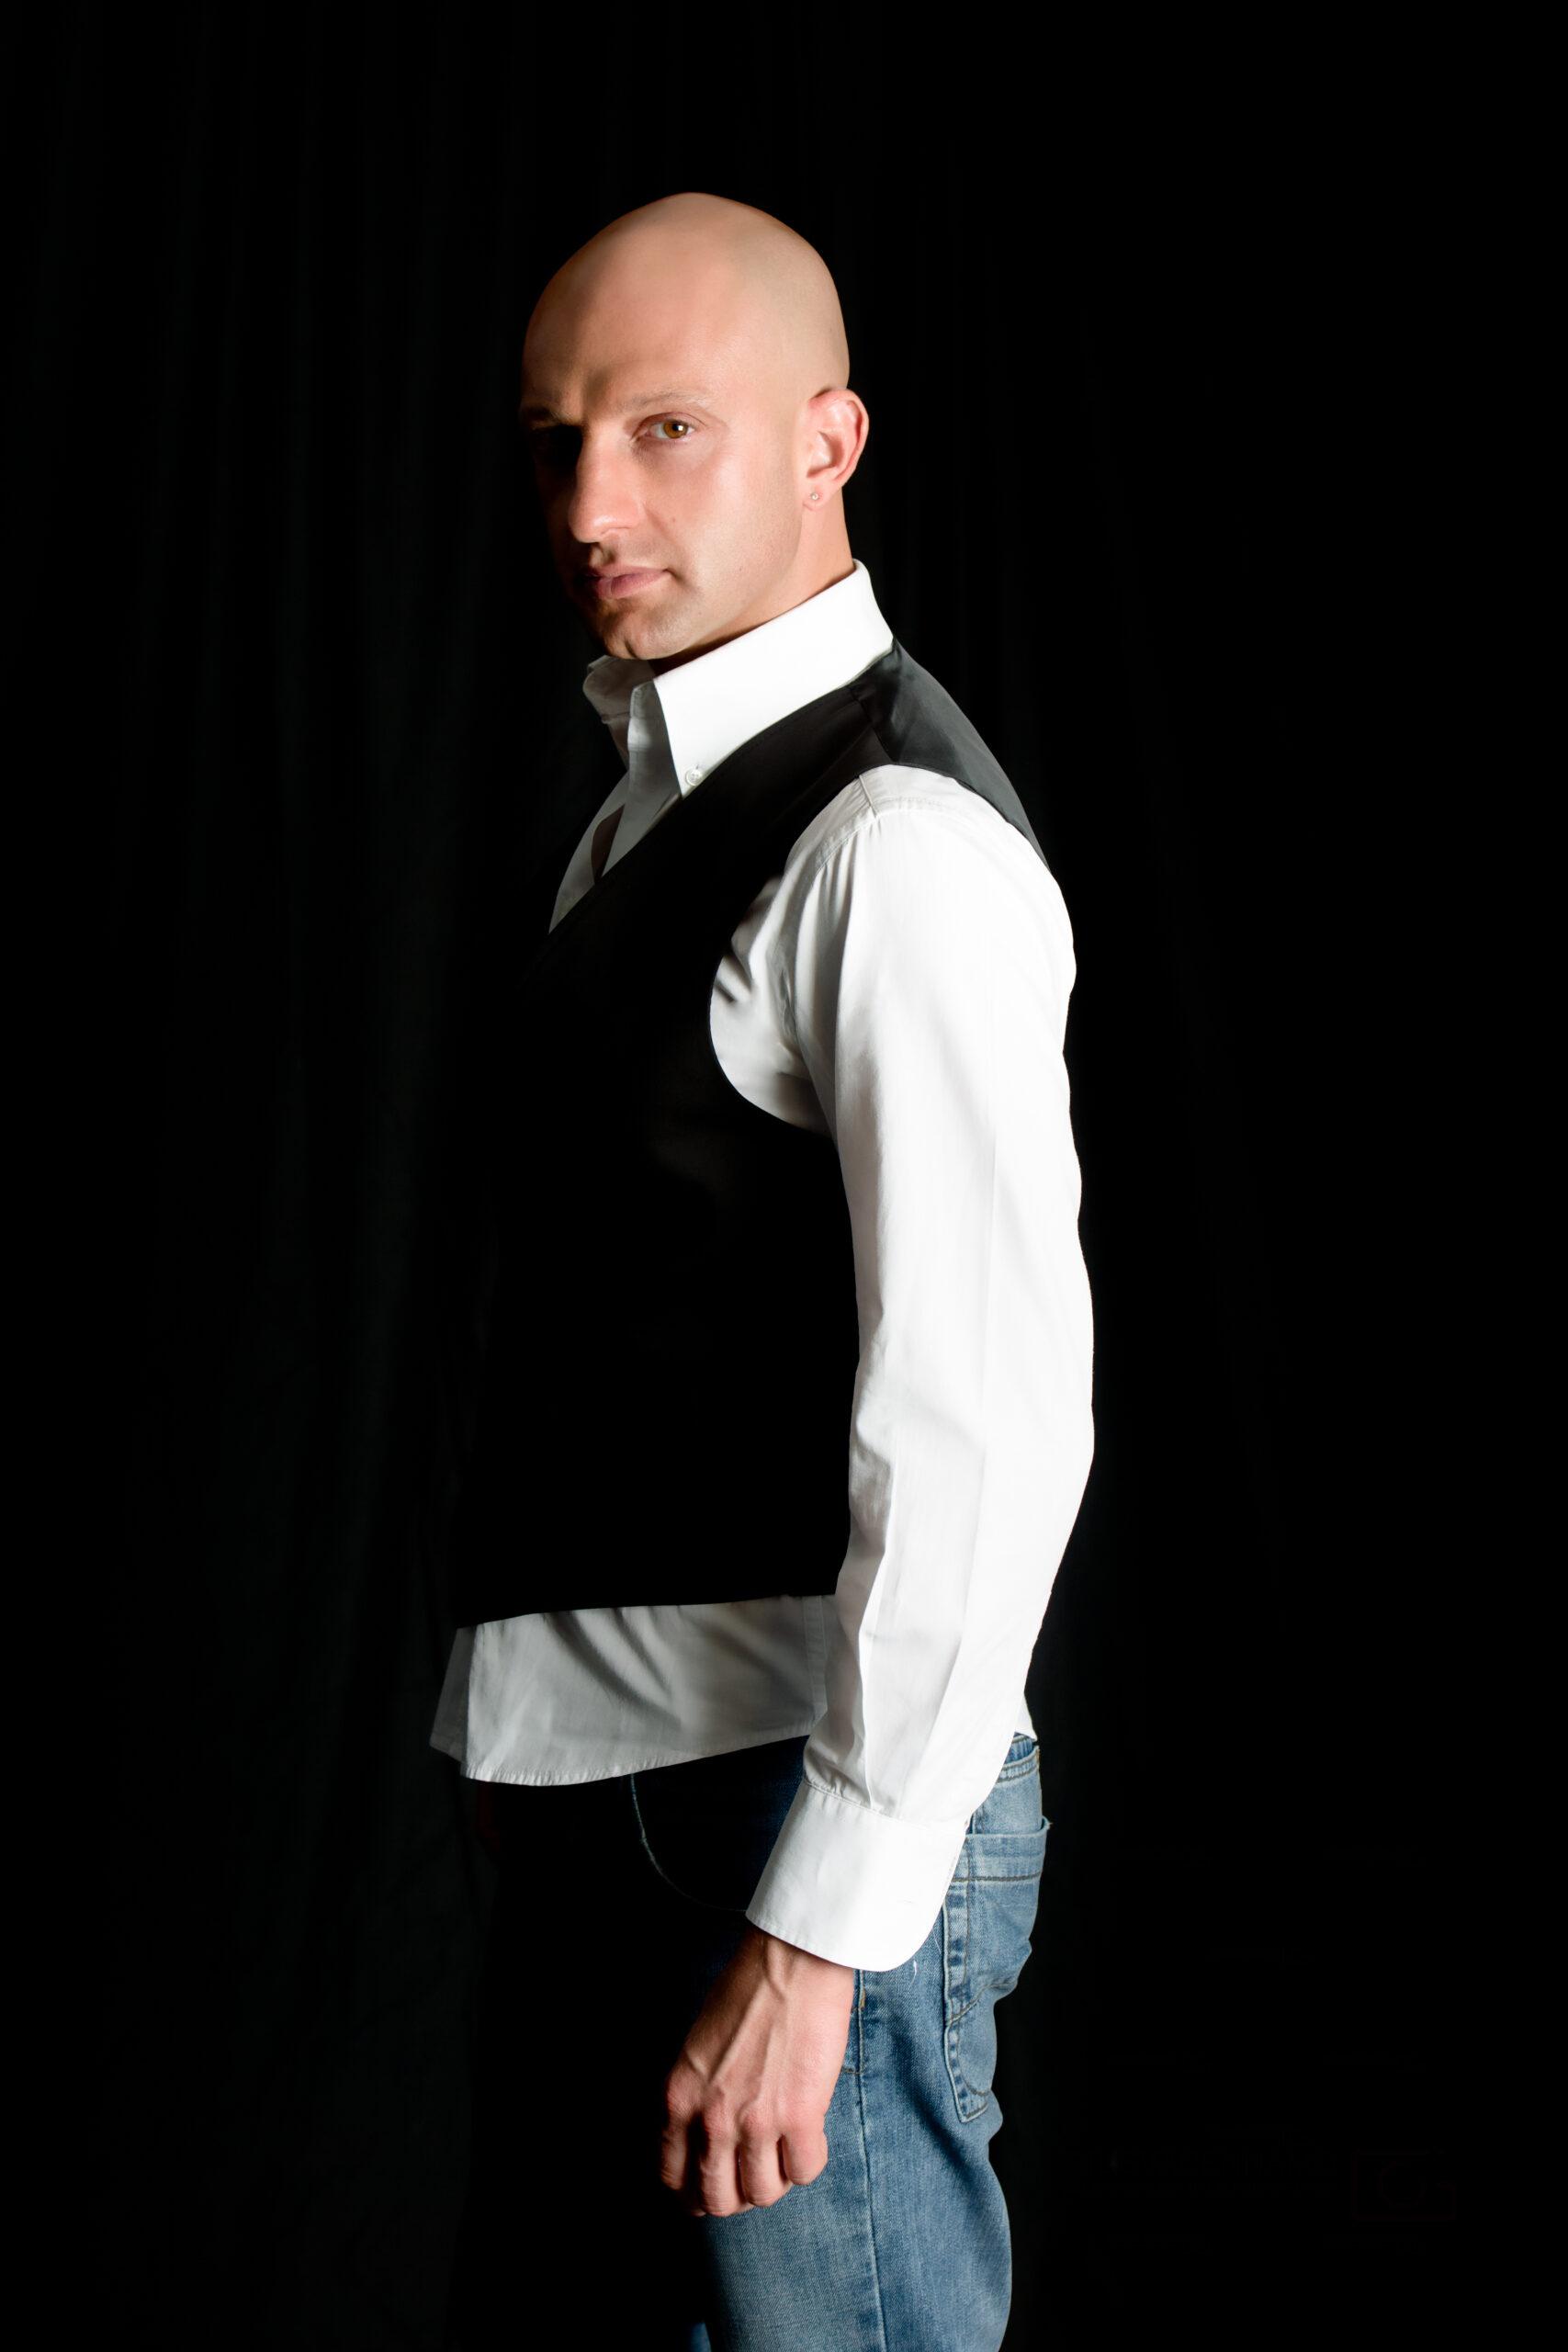 Luca Dall'Amico 140511_5959-Mod